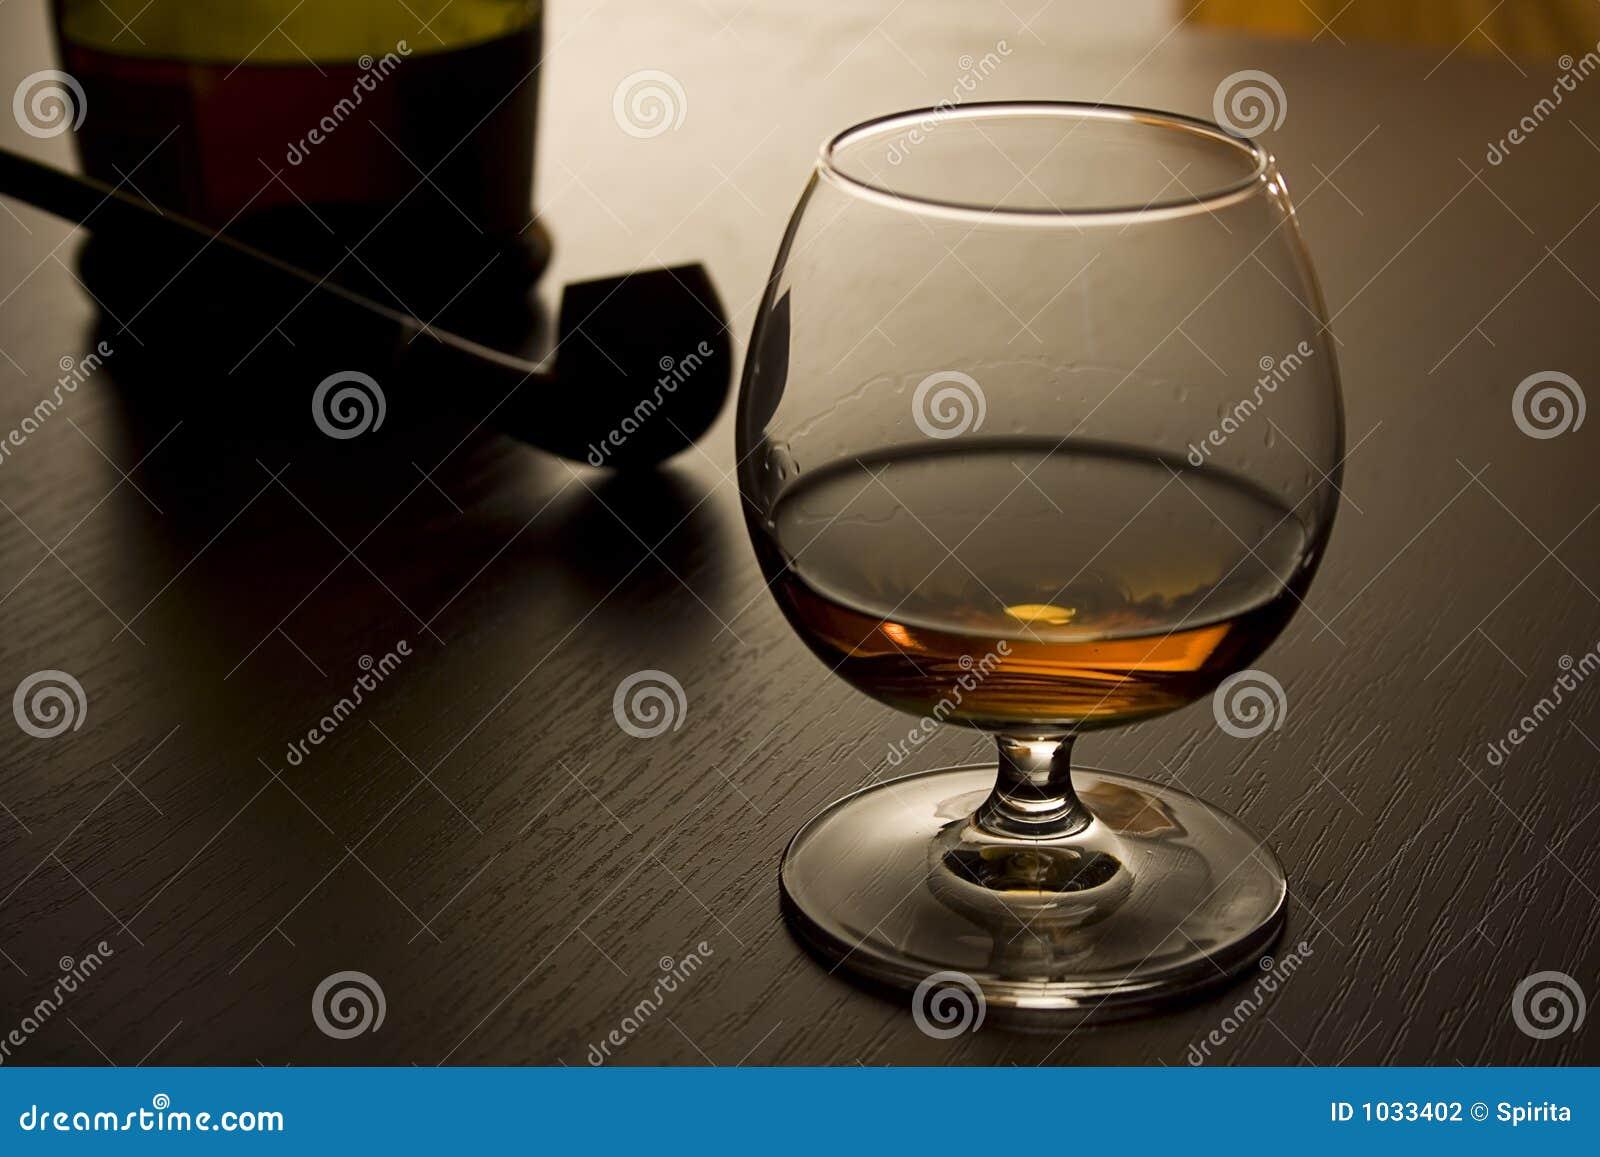 Rura brandy iii